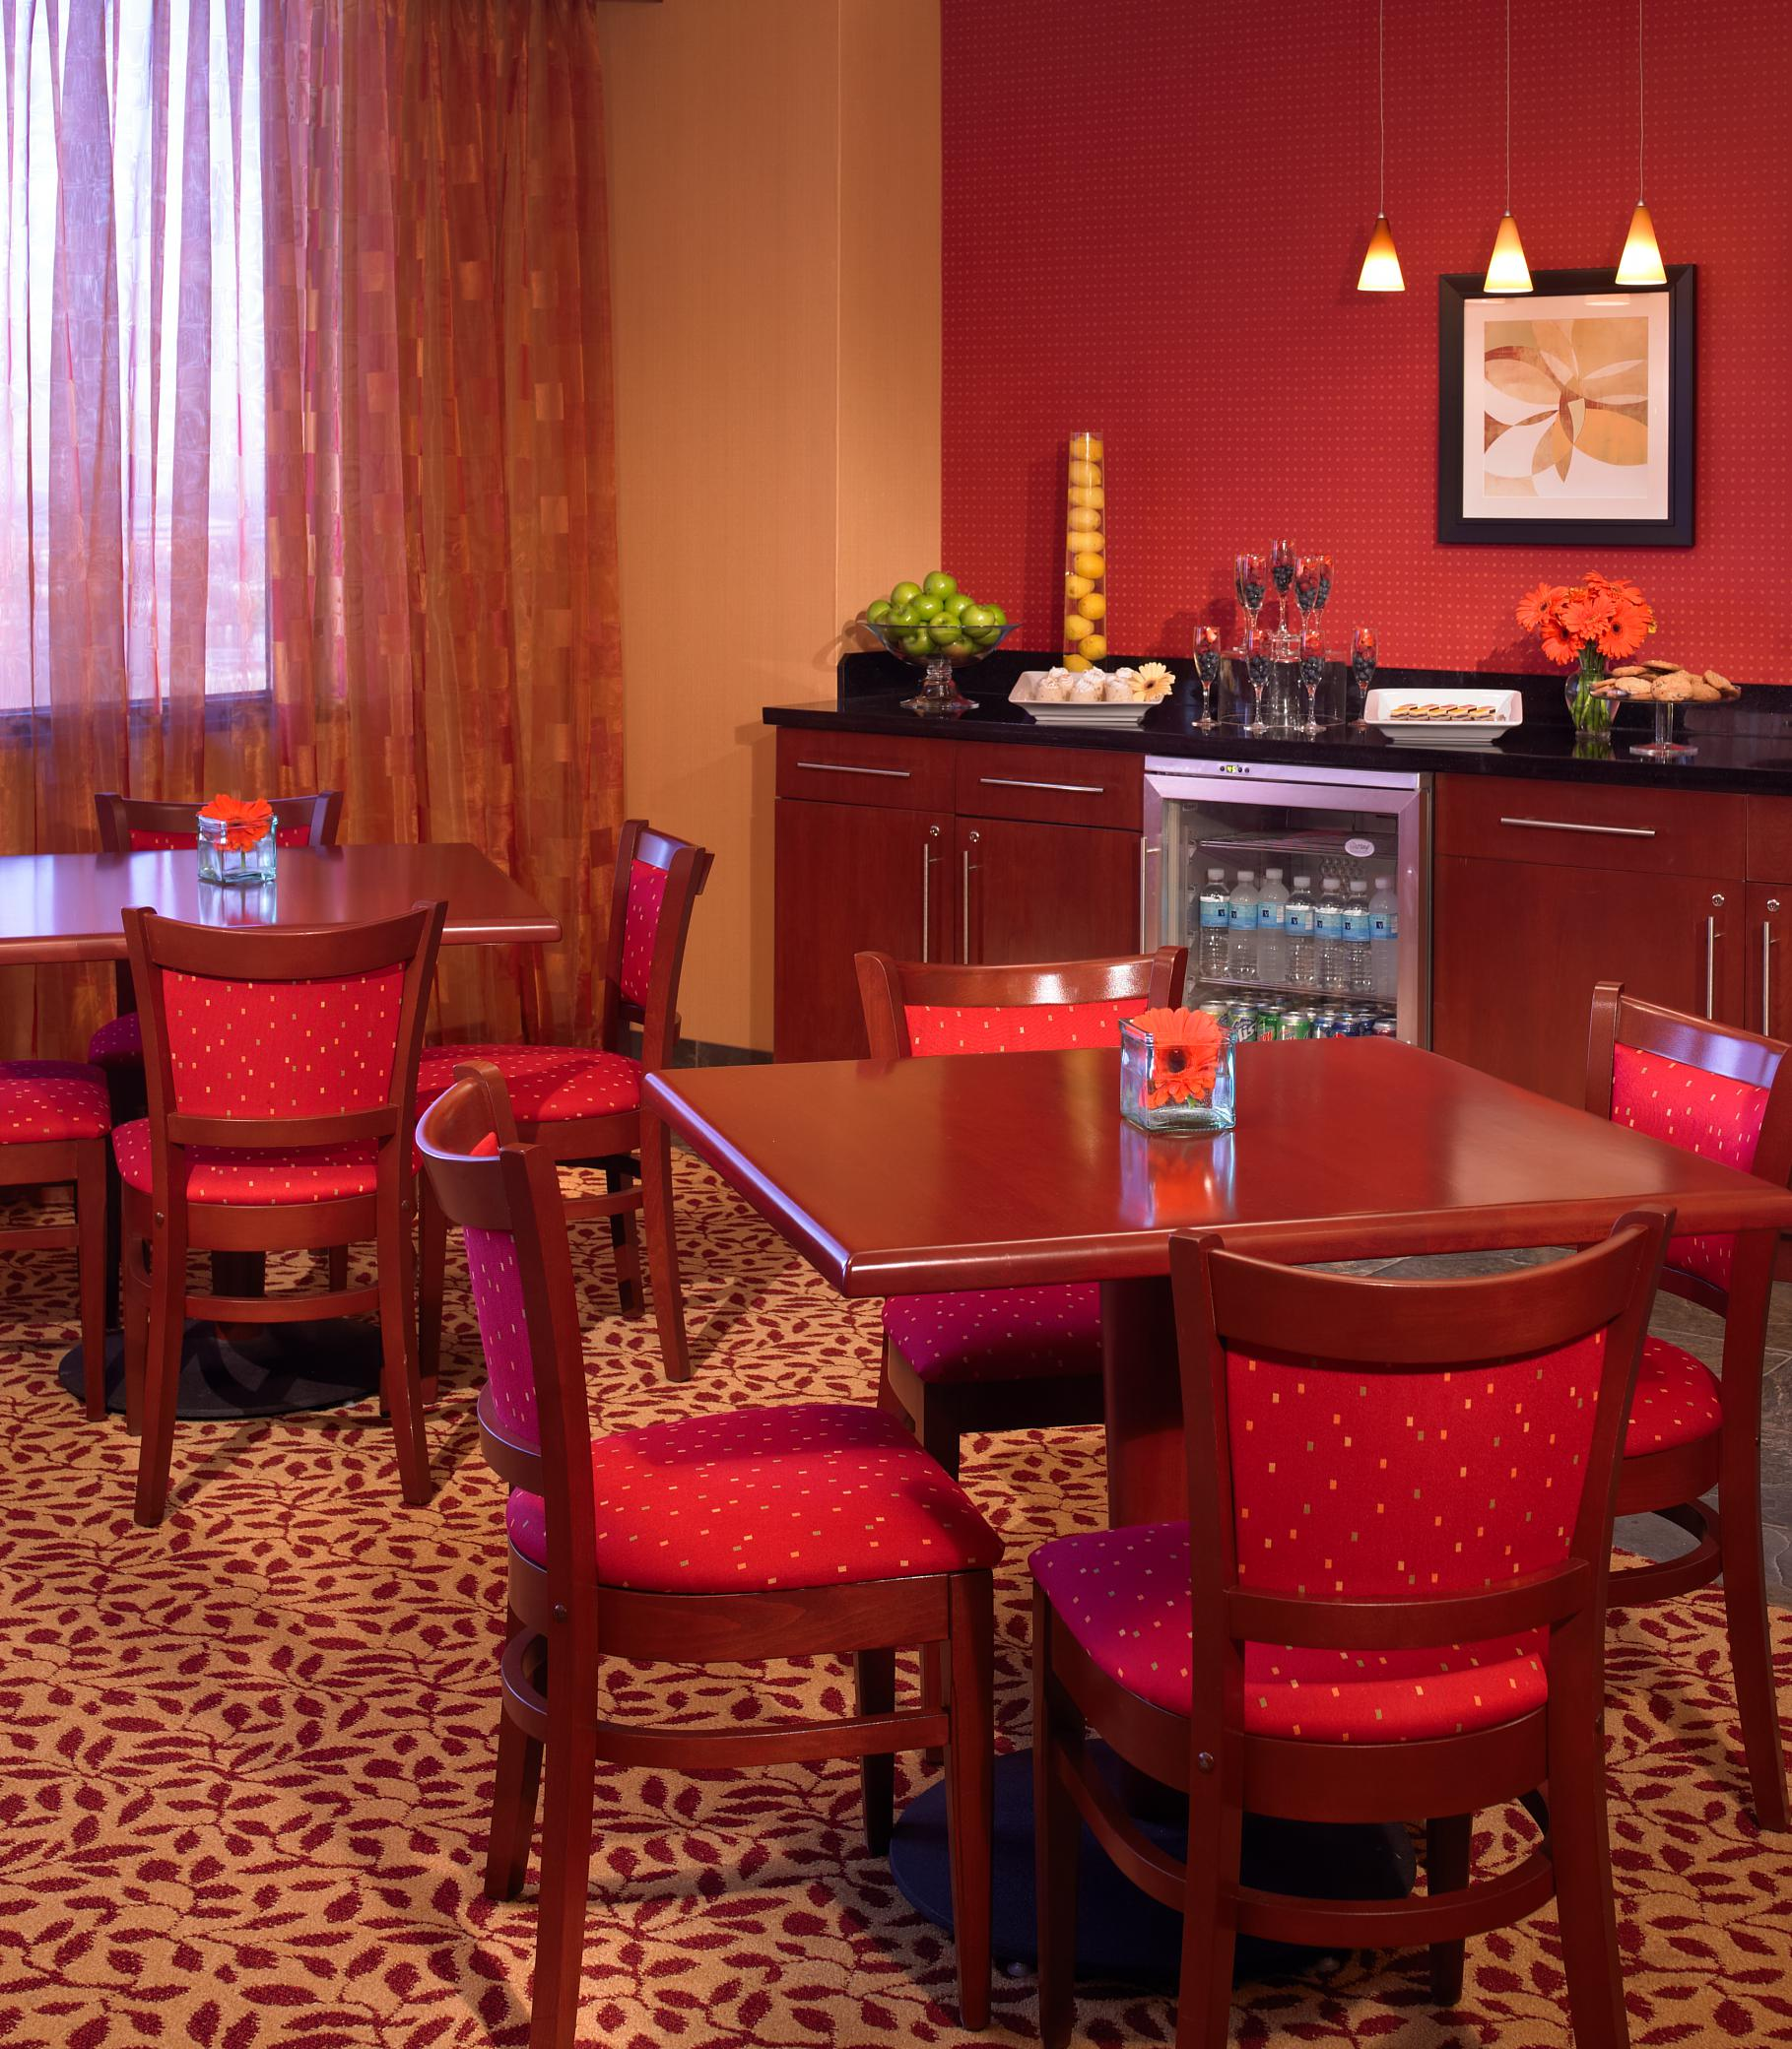 Marriott Kansas City Overland Park image 2